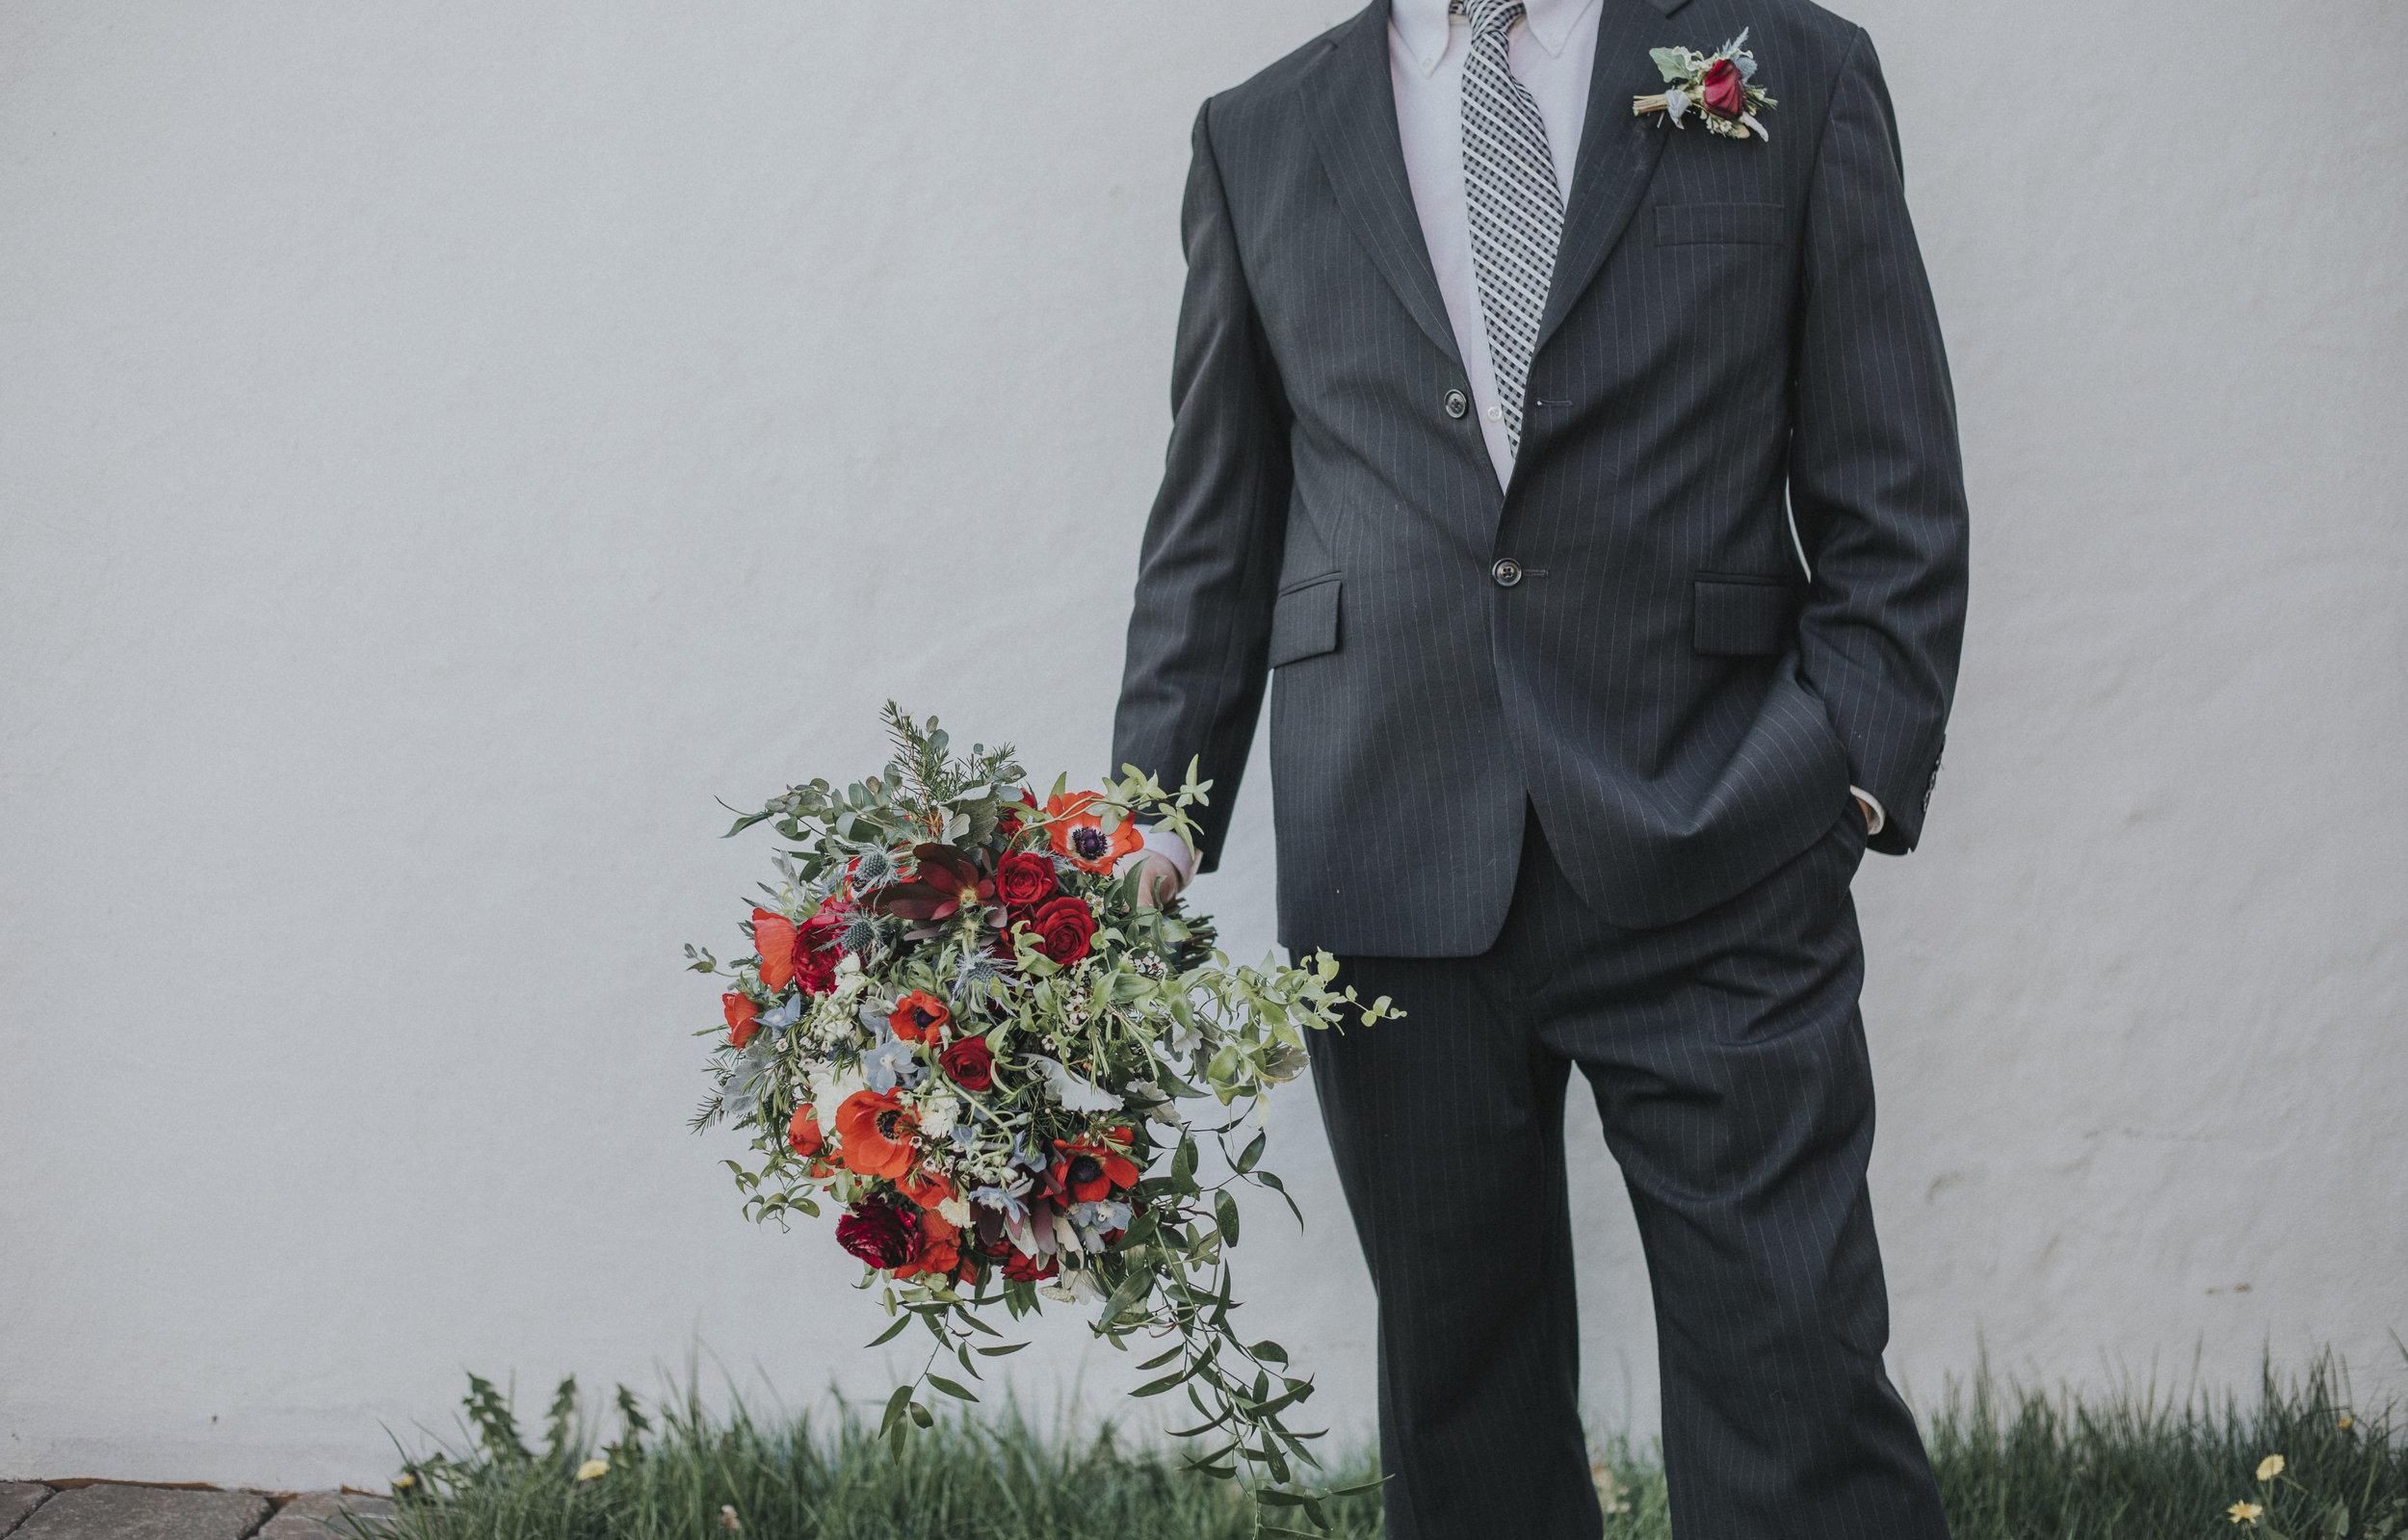 45 midwest-colorado-nebraska-elopement-photography-gretna-turtledoves.jpg